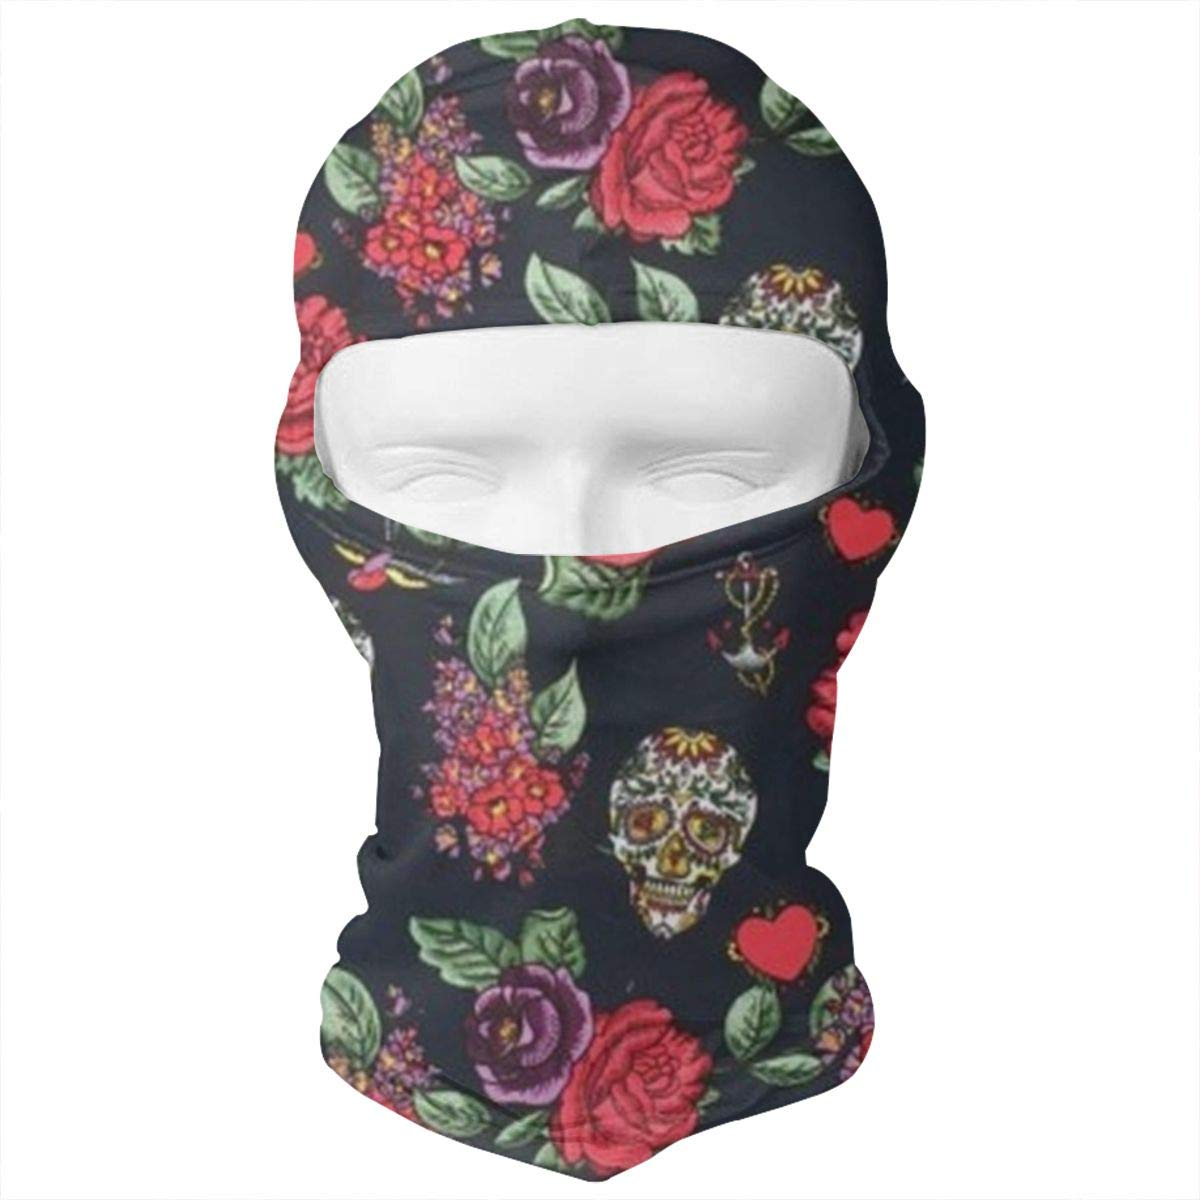 J.C Realm Balaclava Face Mask, Tactical Balaclava Hood, Cap, Scarf, Pirate Hat, Neck Gaiter, Dust Mask, Seamless Headwear, Sugar Skulls Roses Love Hearts